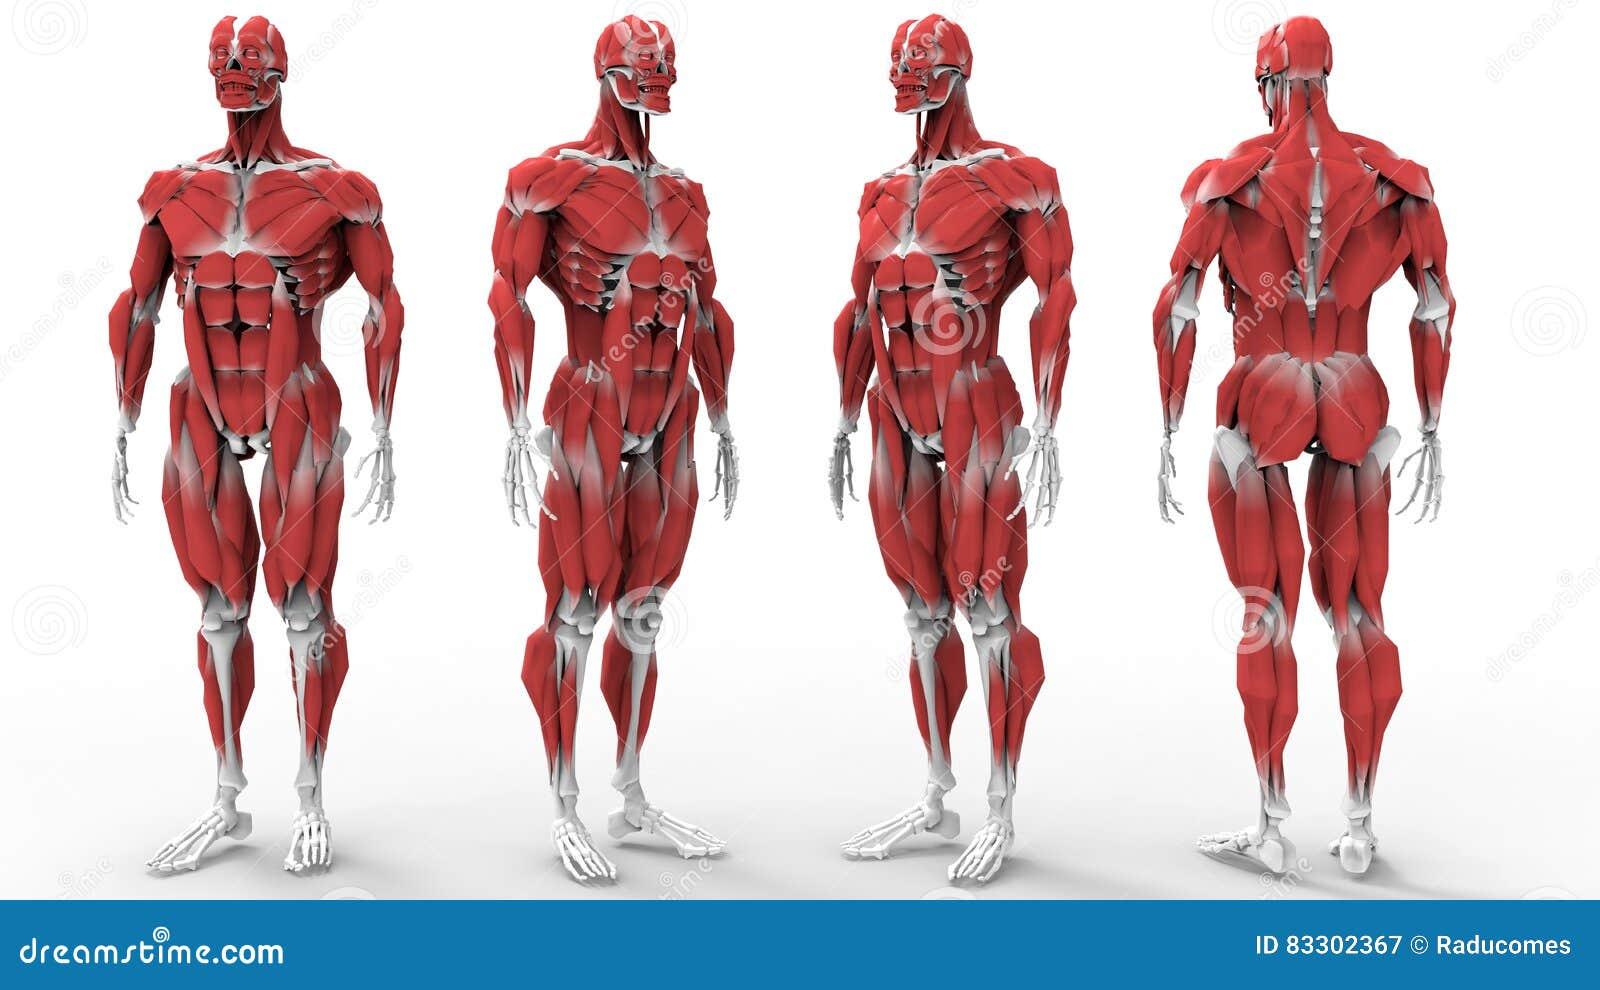 Muscles and bones anatomy stock illustration. Illustration of human ...